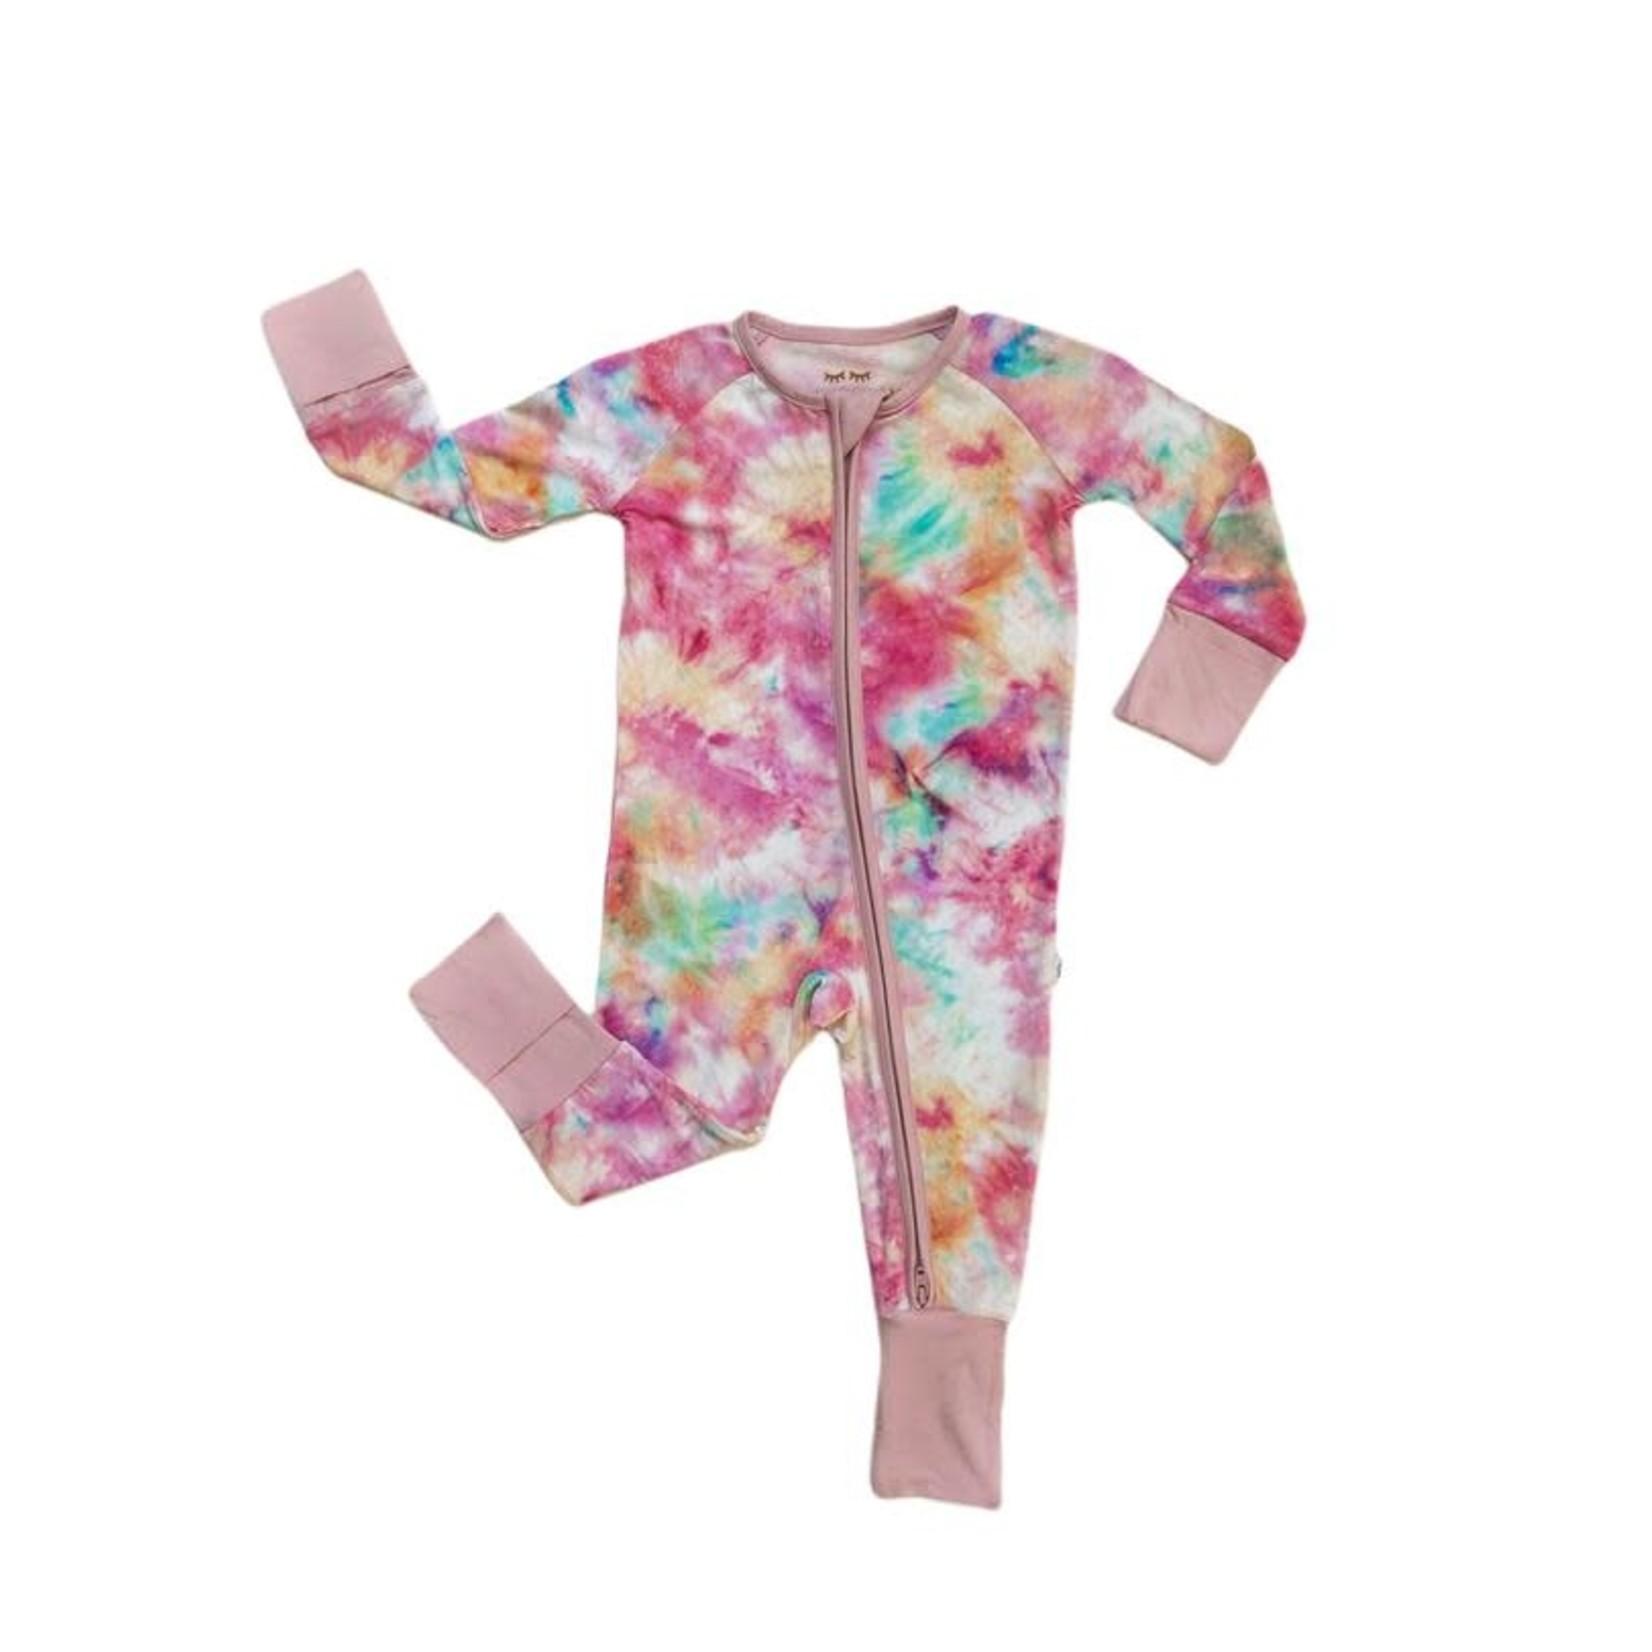 Little Sleepies Convertible Romper/Sleeper Cotton Candy Tie-Dye